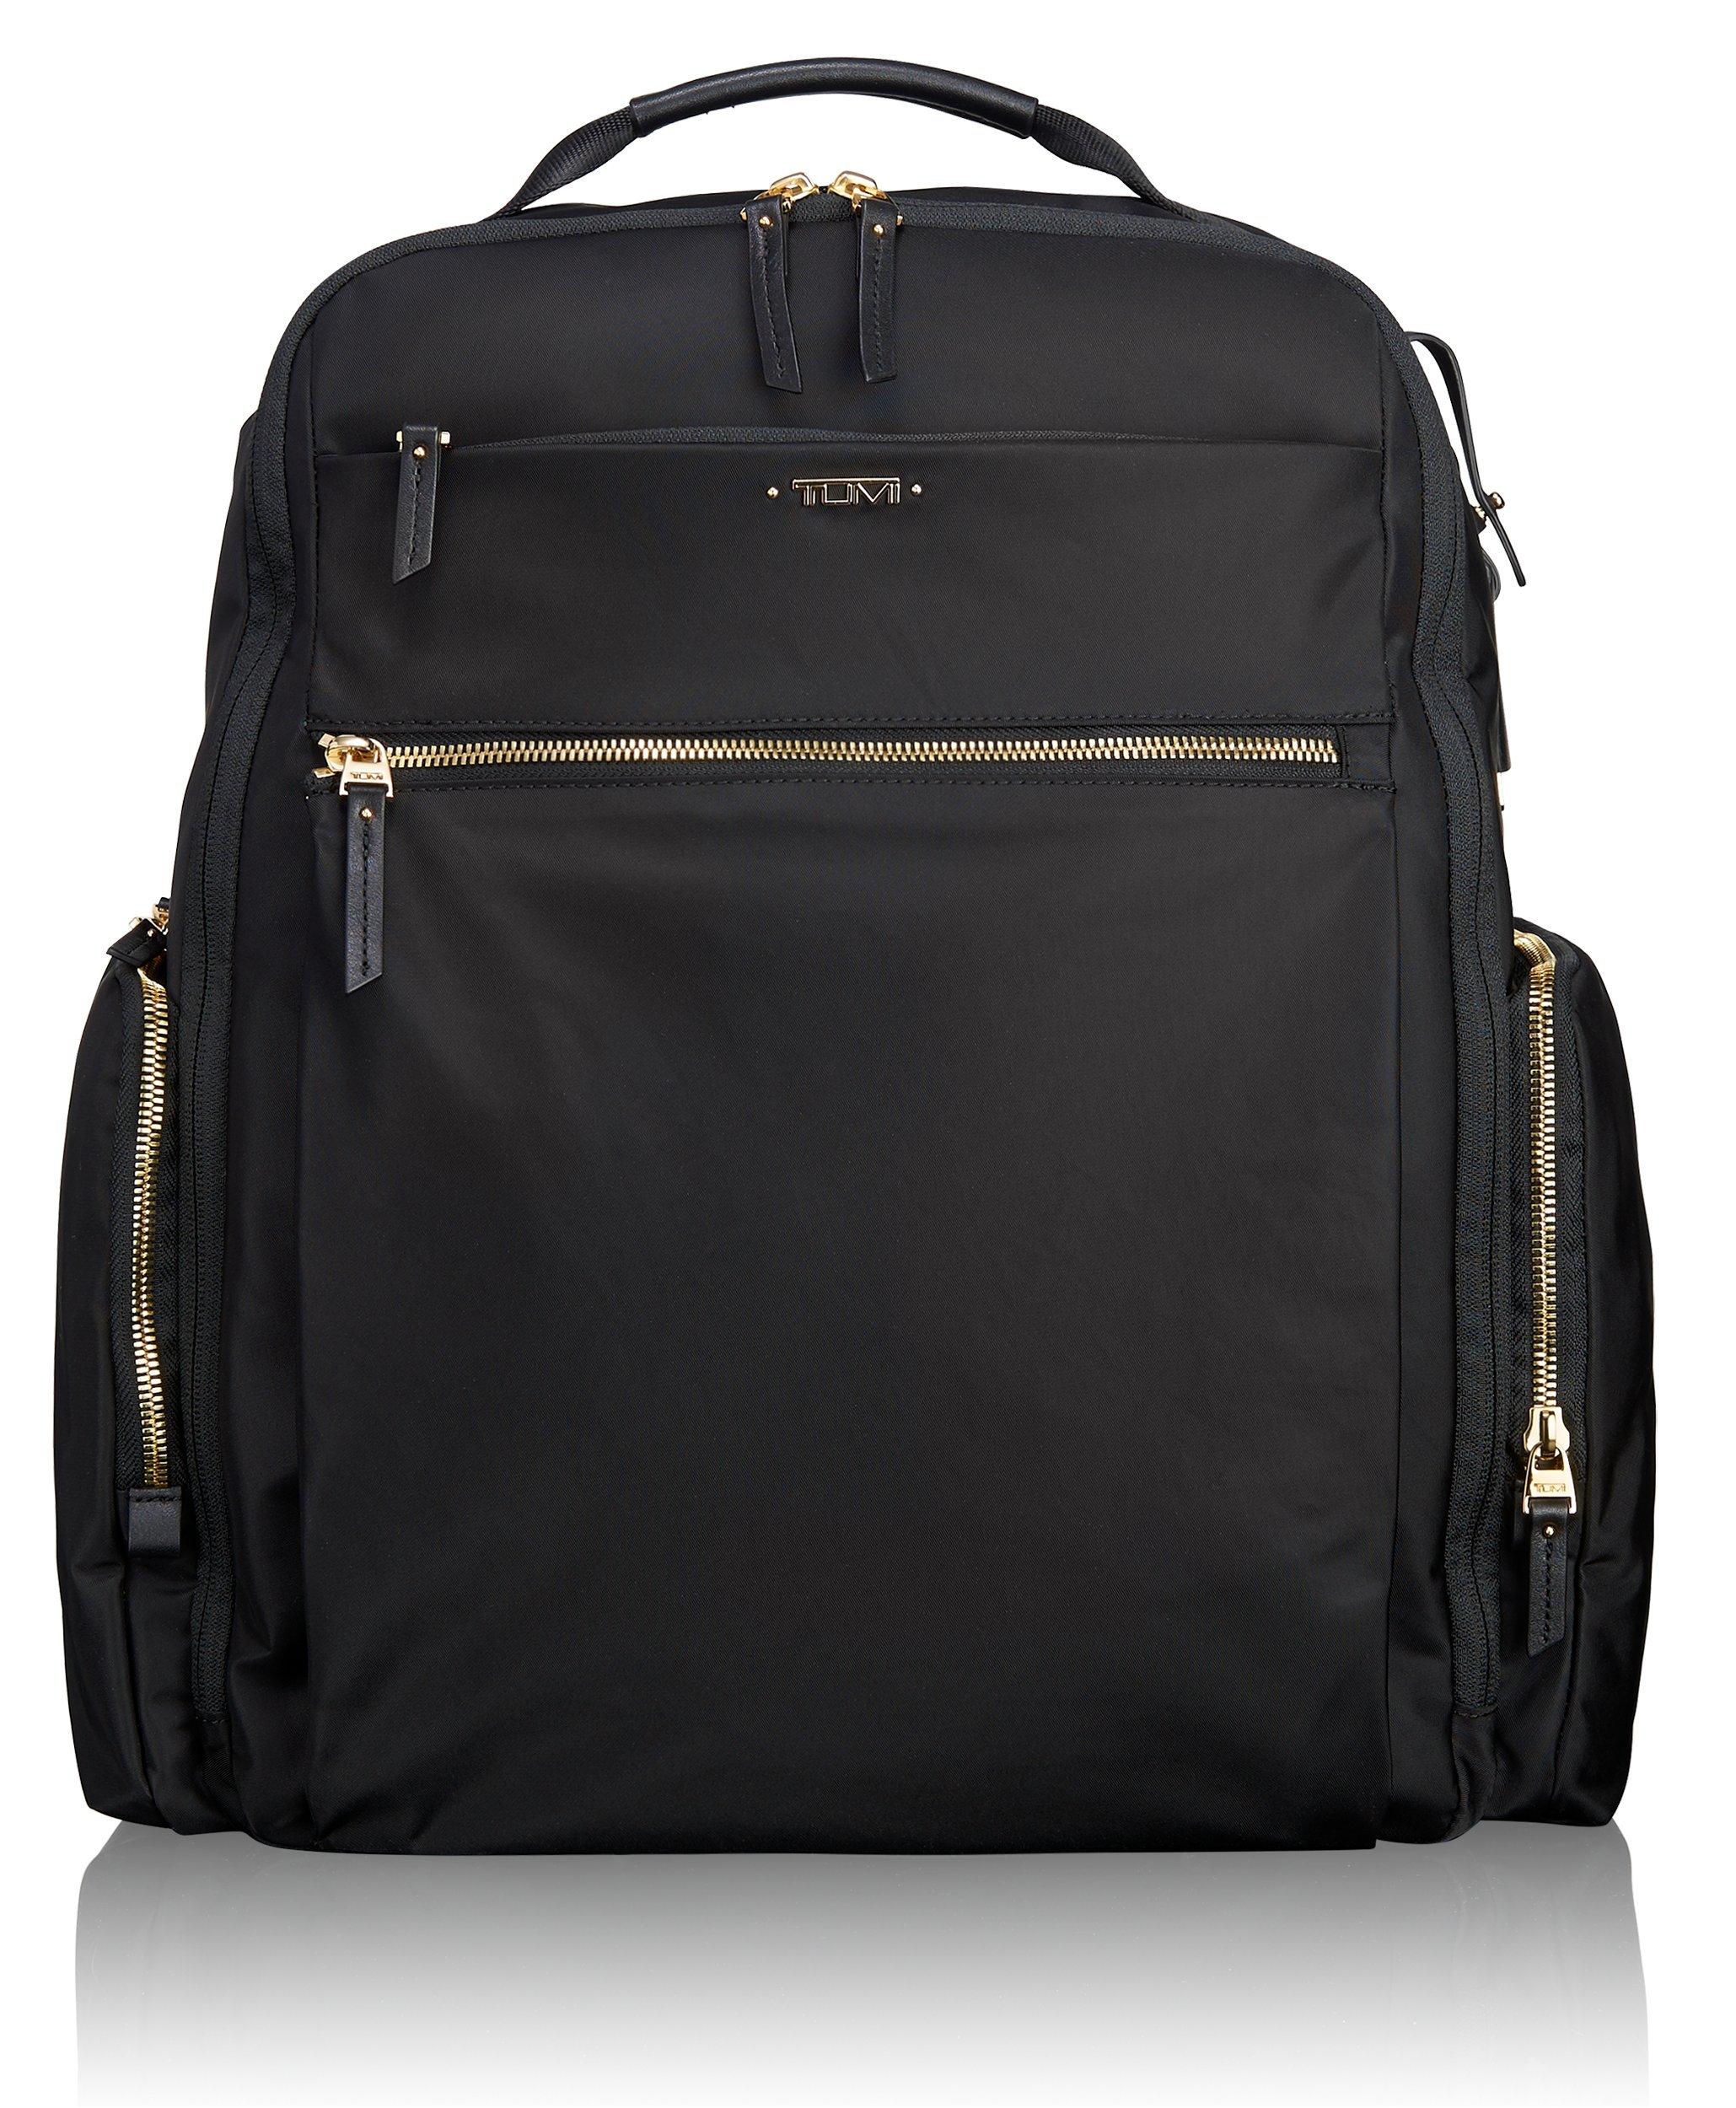 Tumi Women's Voyageur Ari T-Pass Backpack, Black, One Size